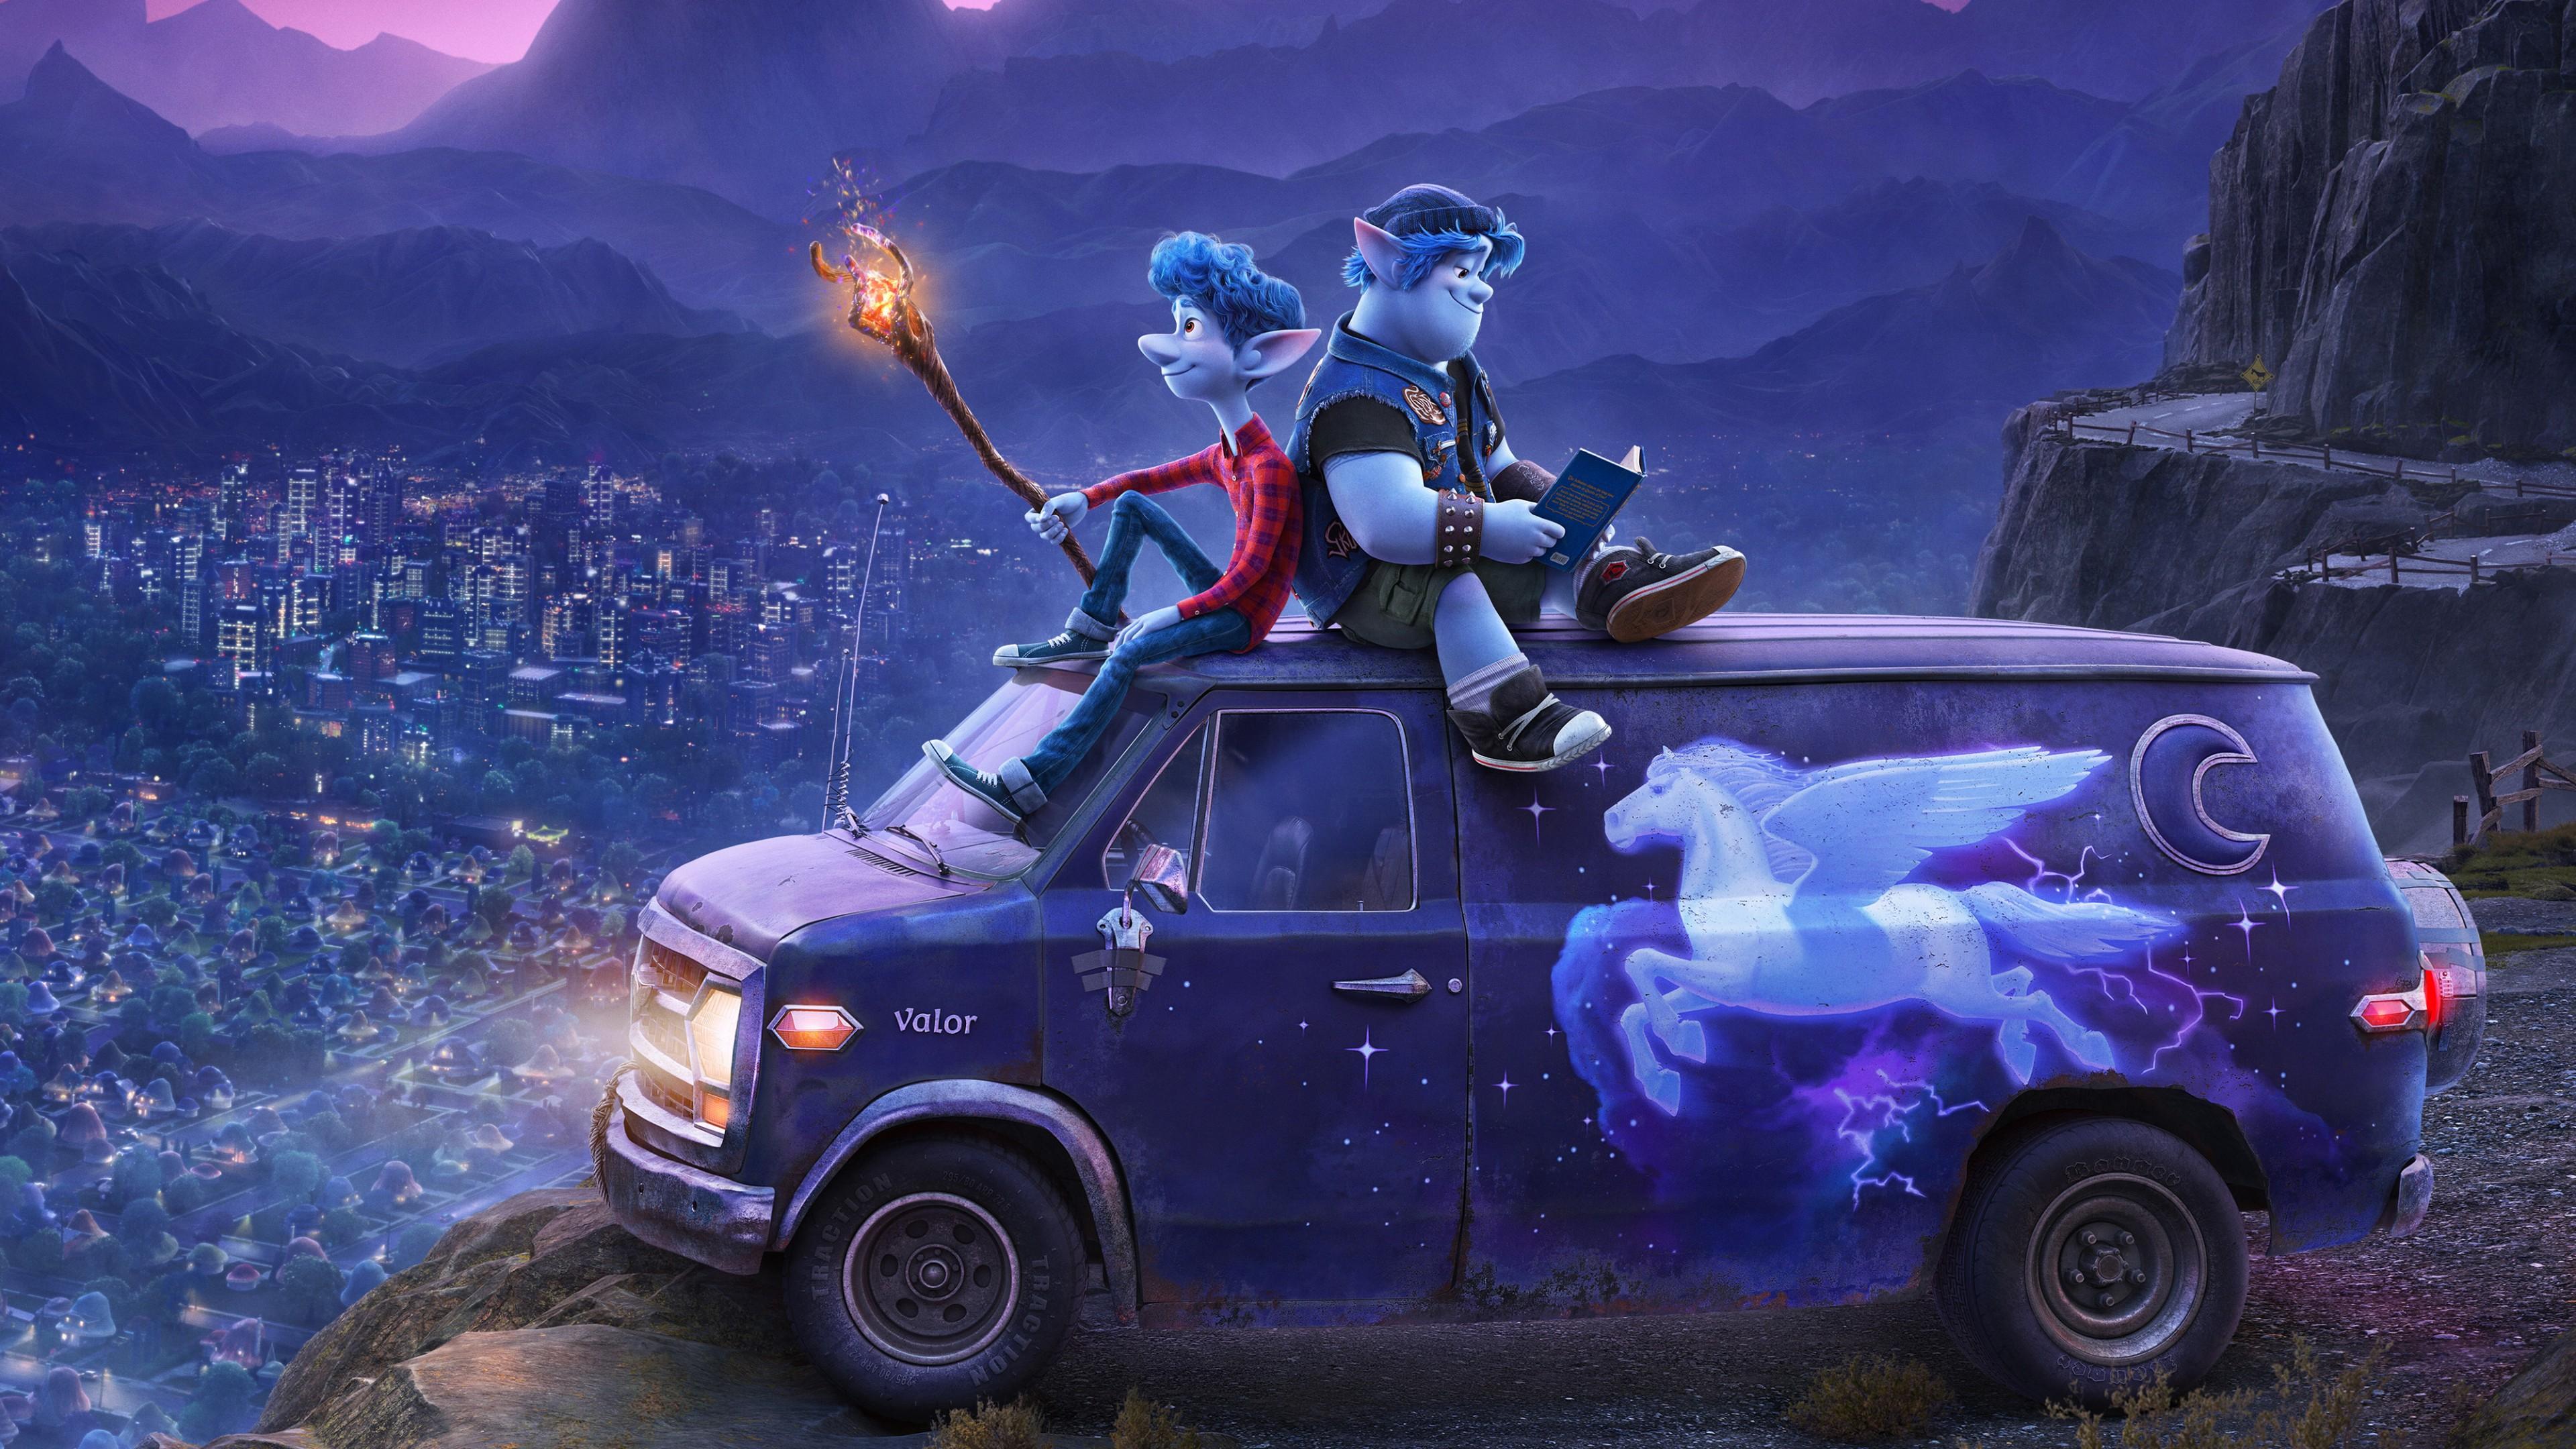 Onward 2020 Animation Pixar 4K Wallpapers HD Wallpapers 3840x2160